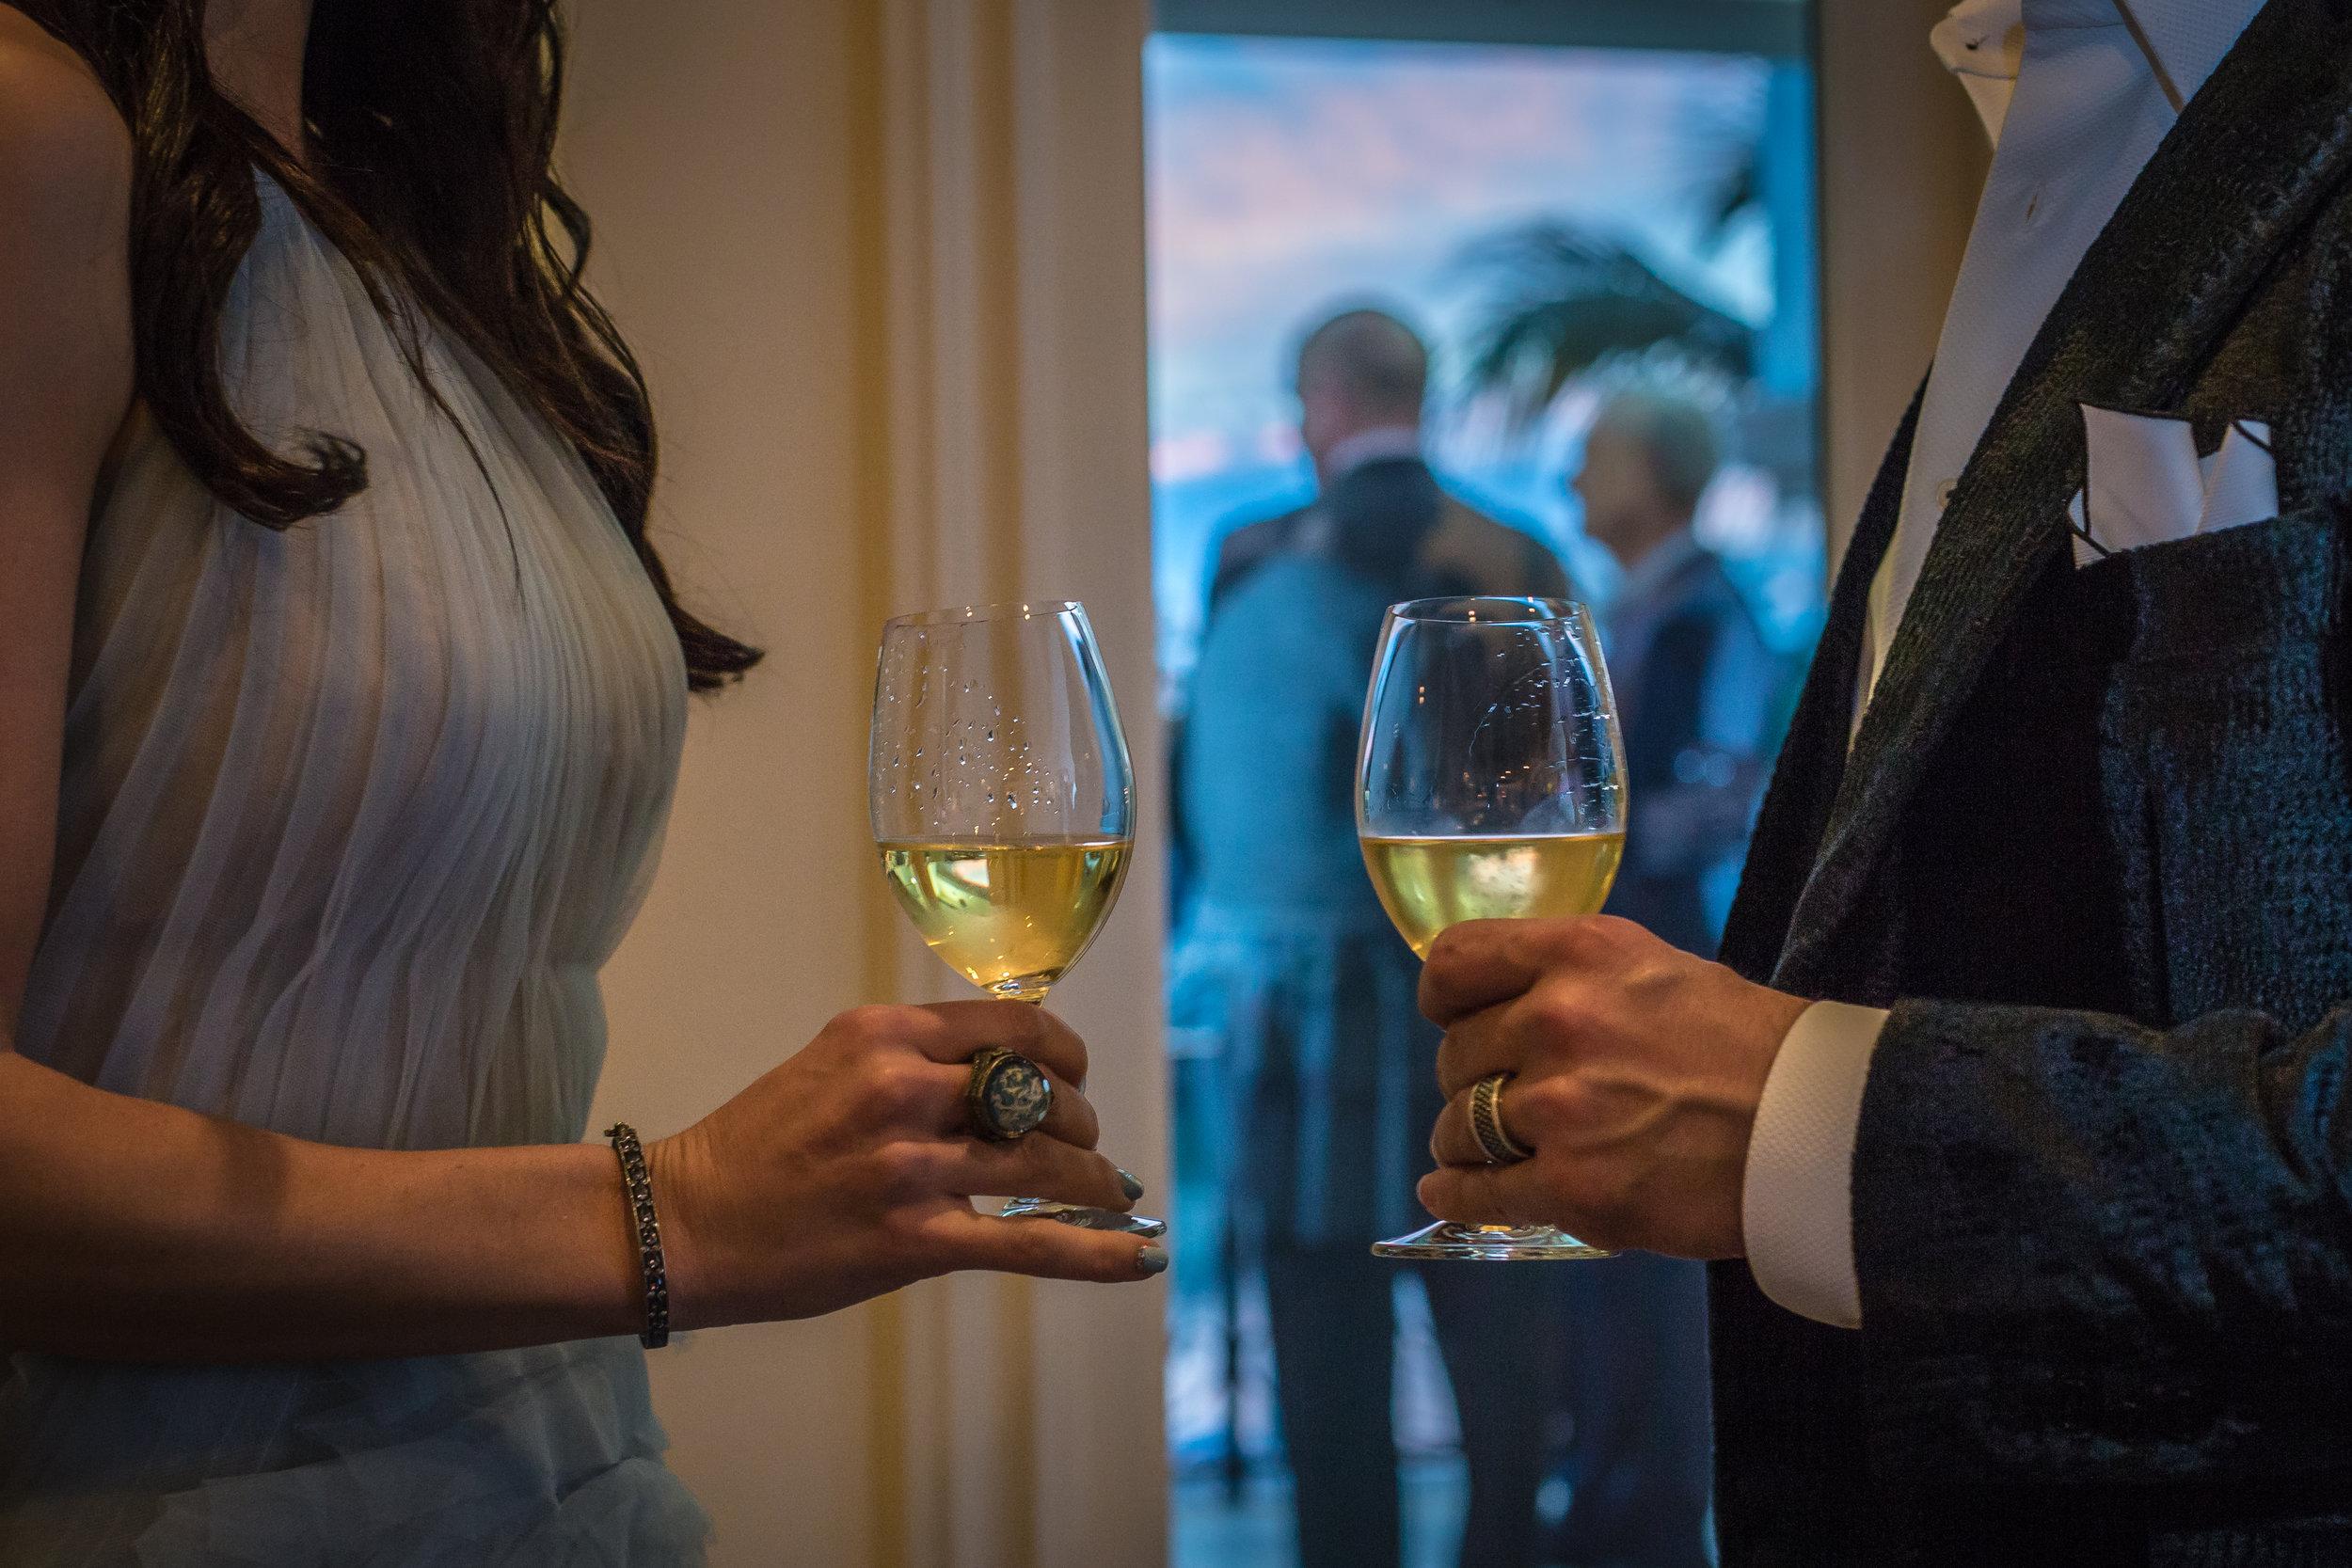 Naples_Winter_Wine_festival_2019_Nicole_Nixon-6389.JPG